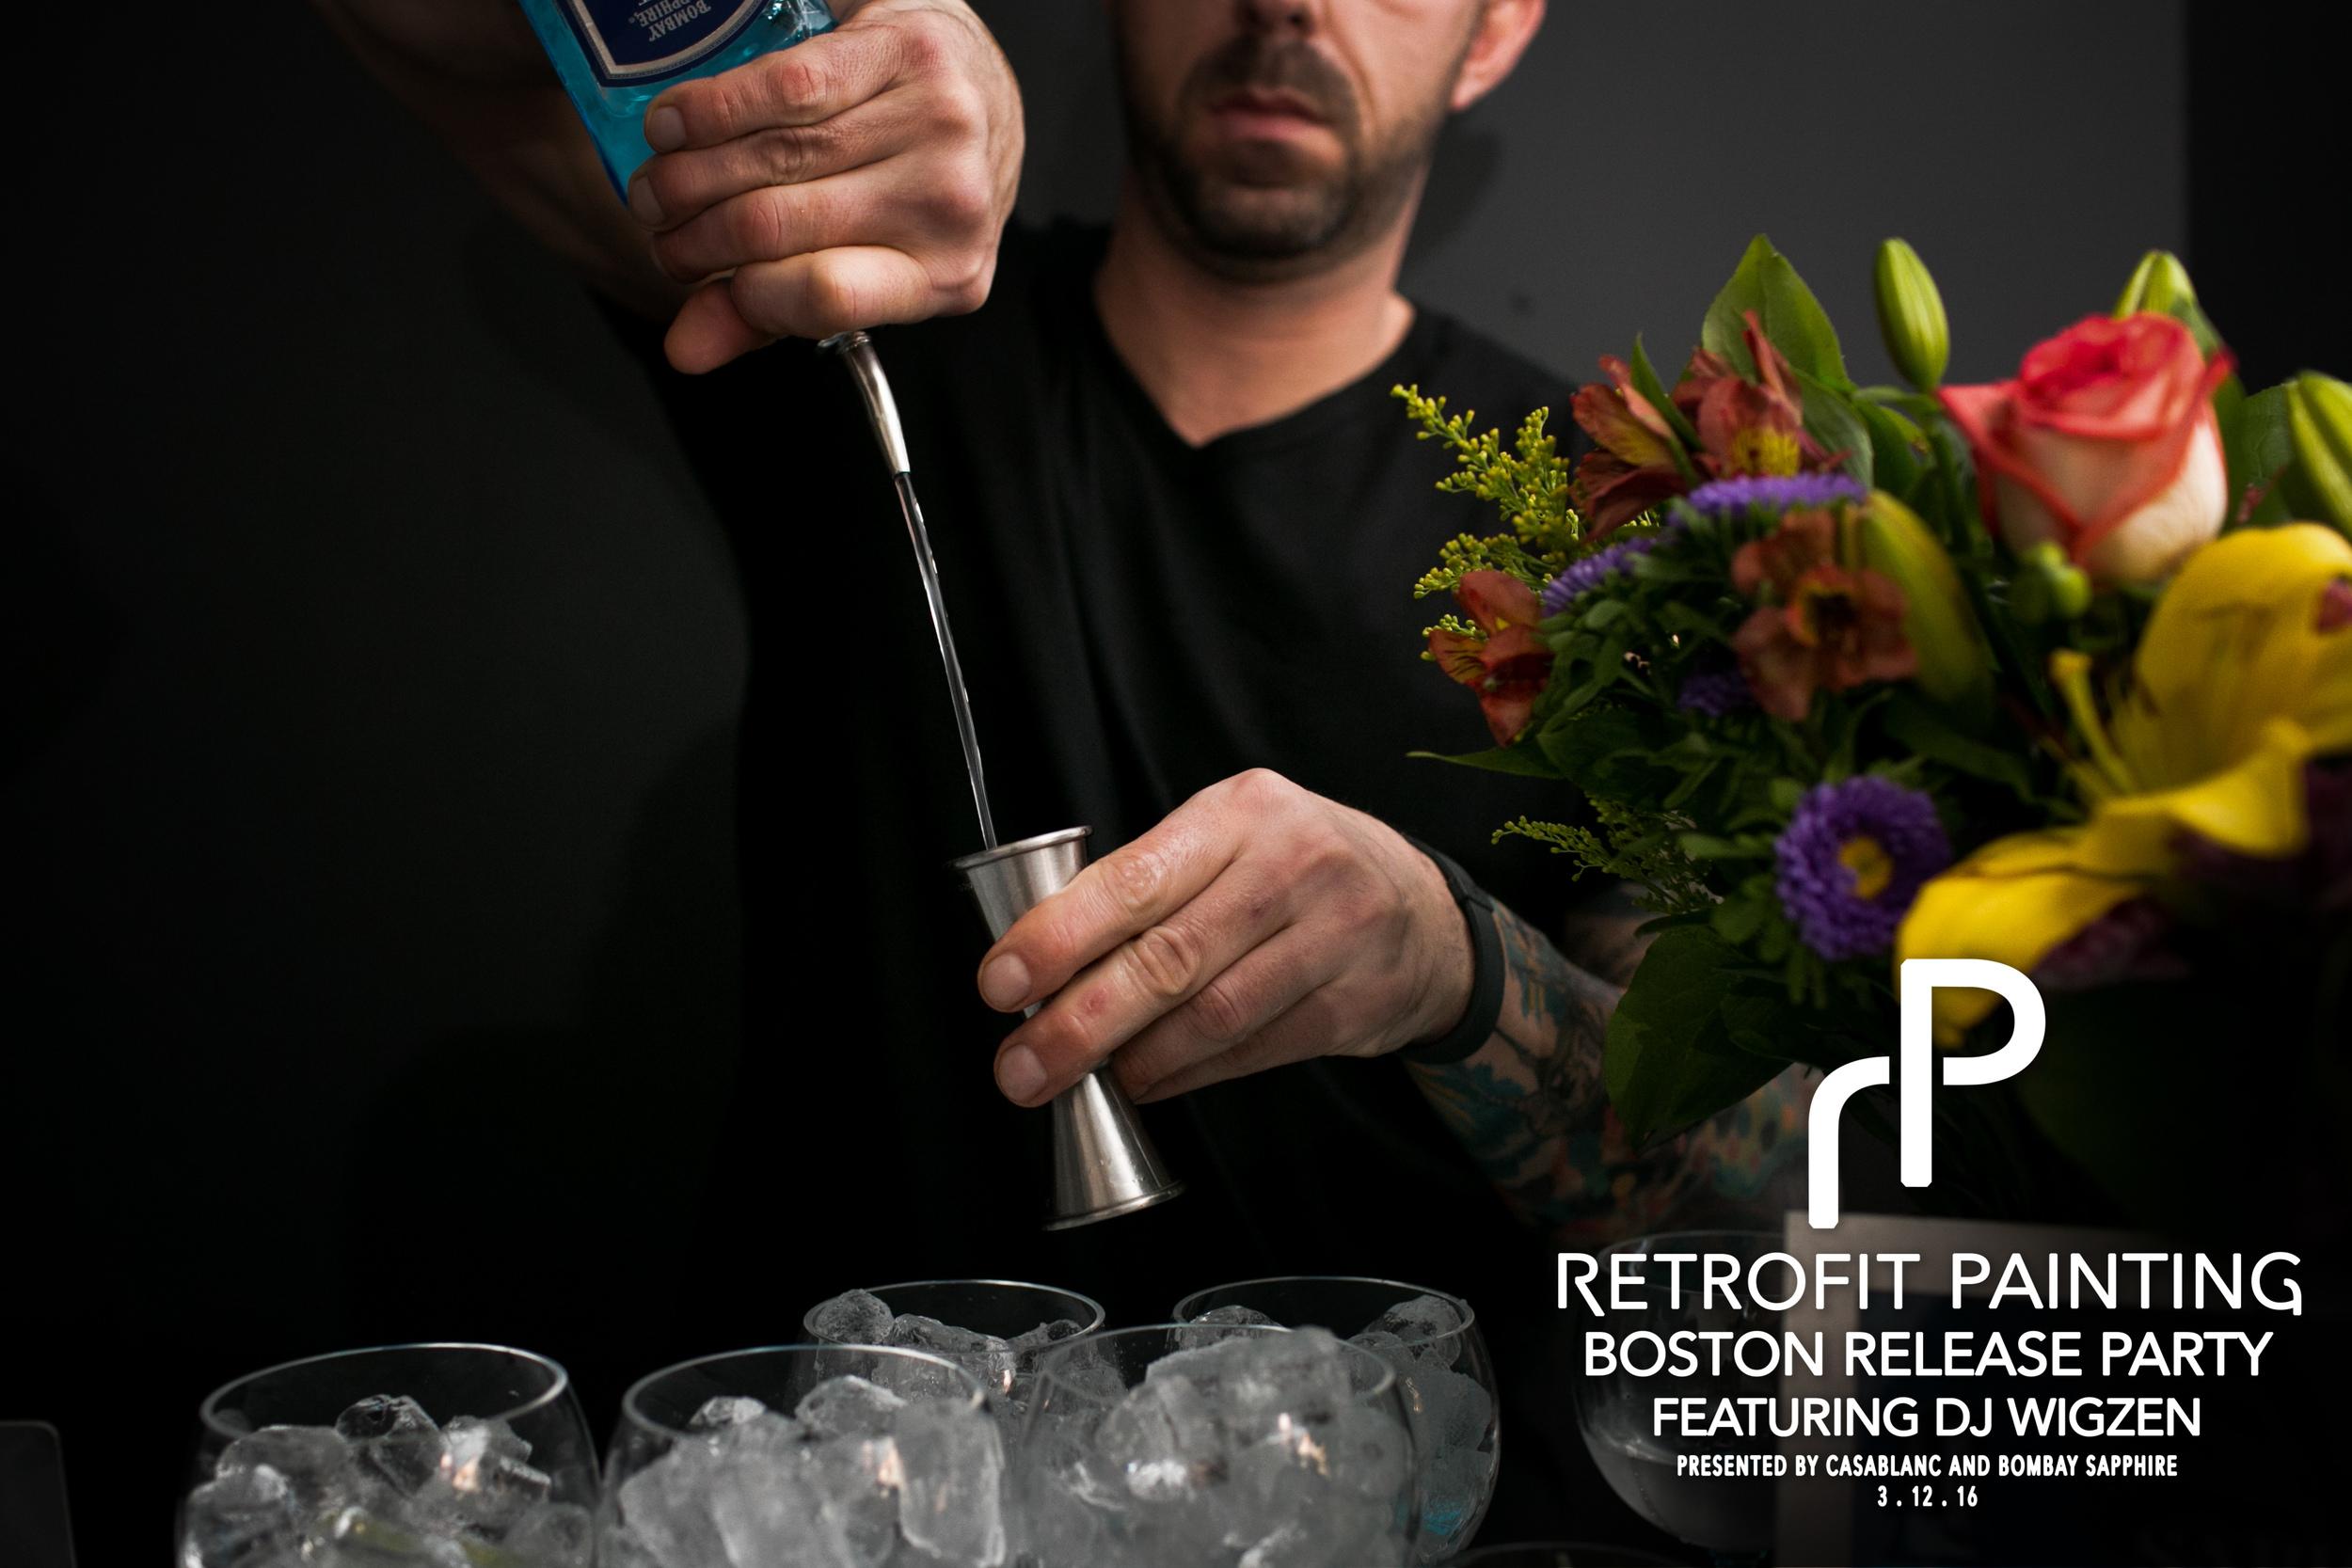 Retrofit Painting Boston Release Party 0188.jpg